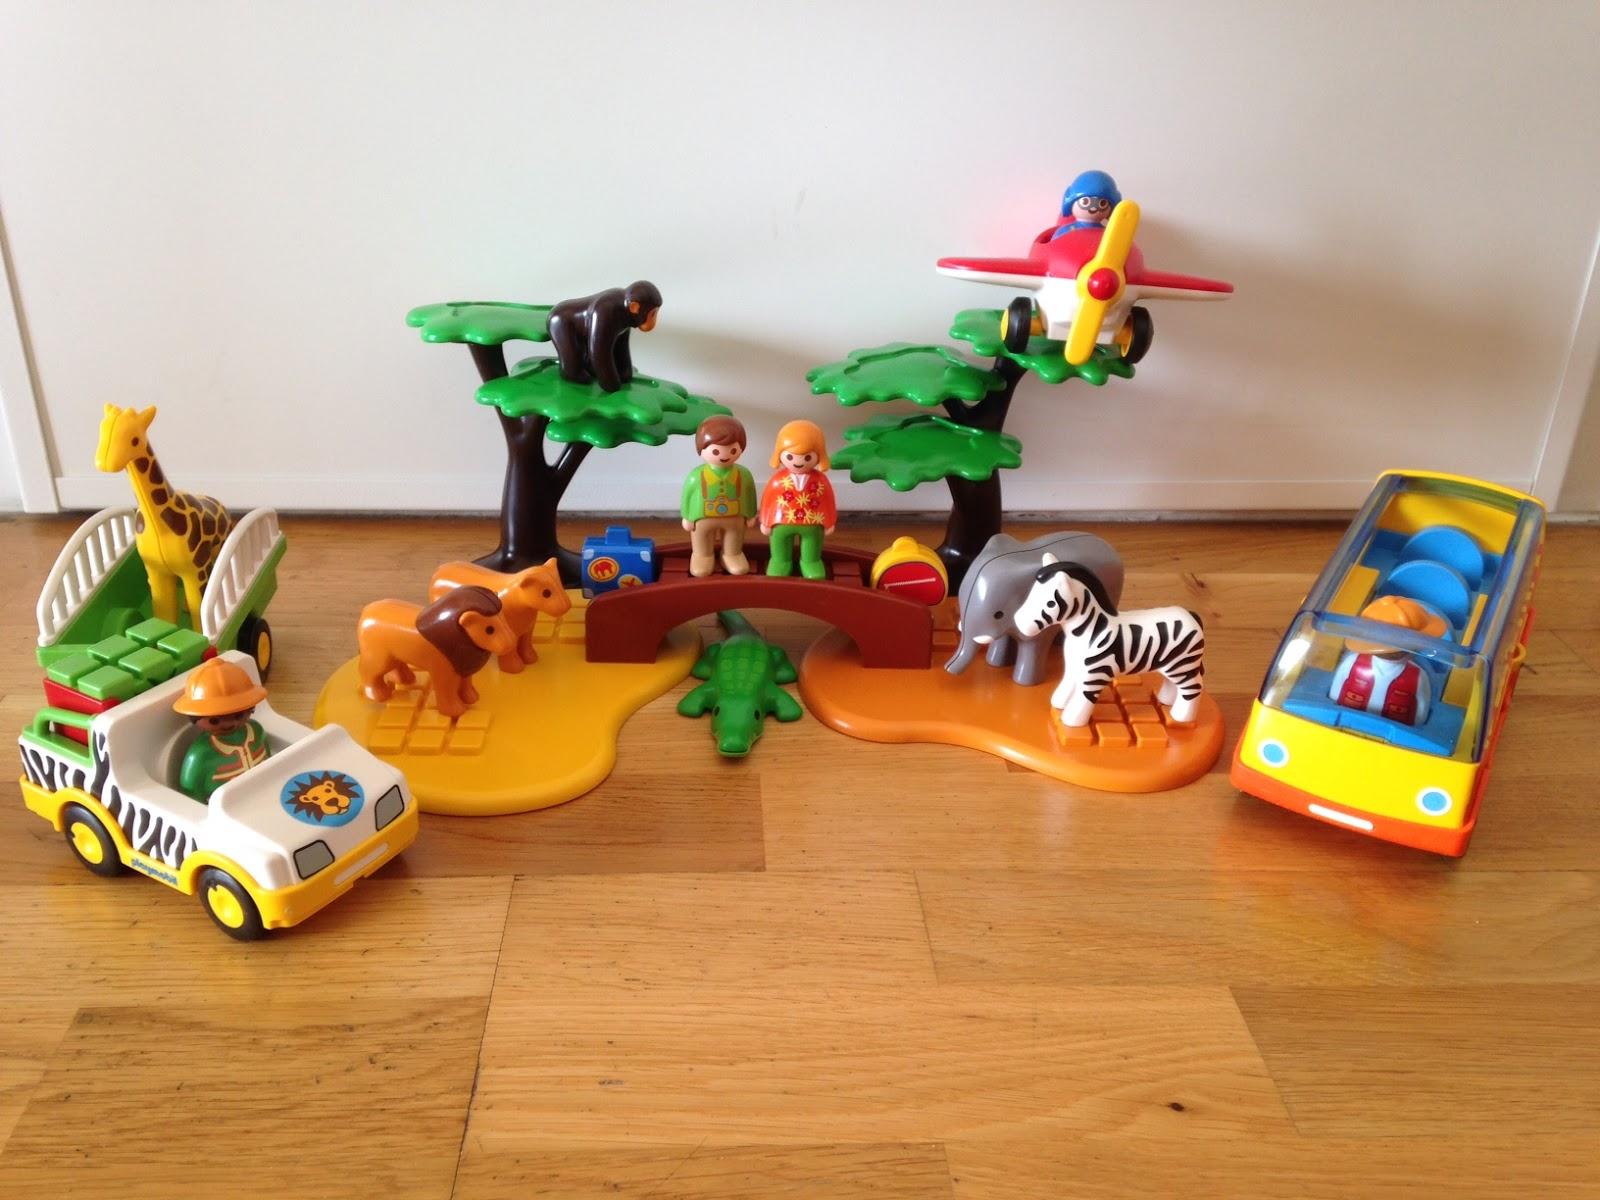 Grand Jardin D Enfant Playmobil dedans Grand Jardin D Enfant Playmobil